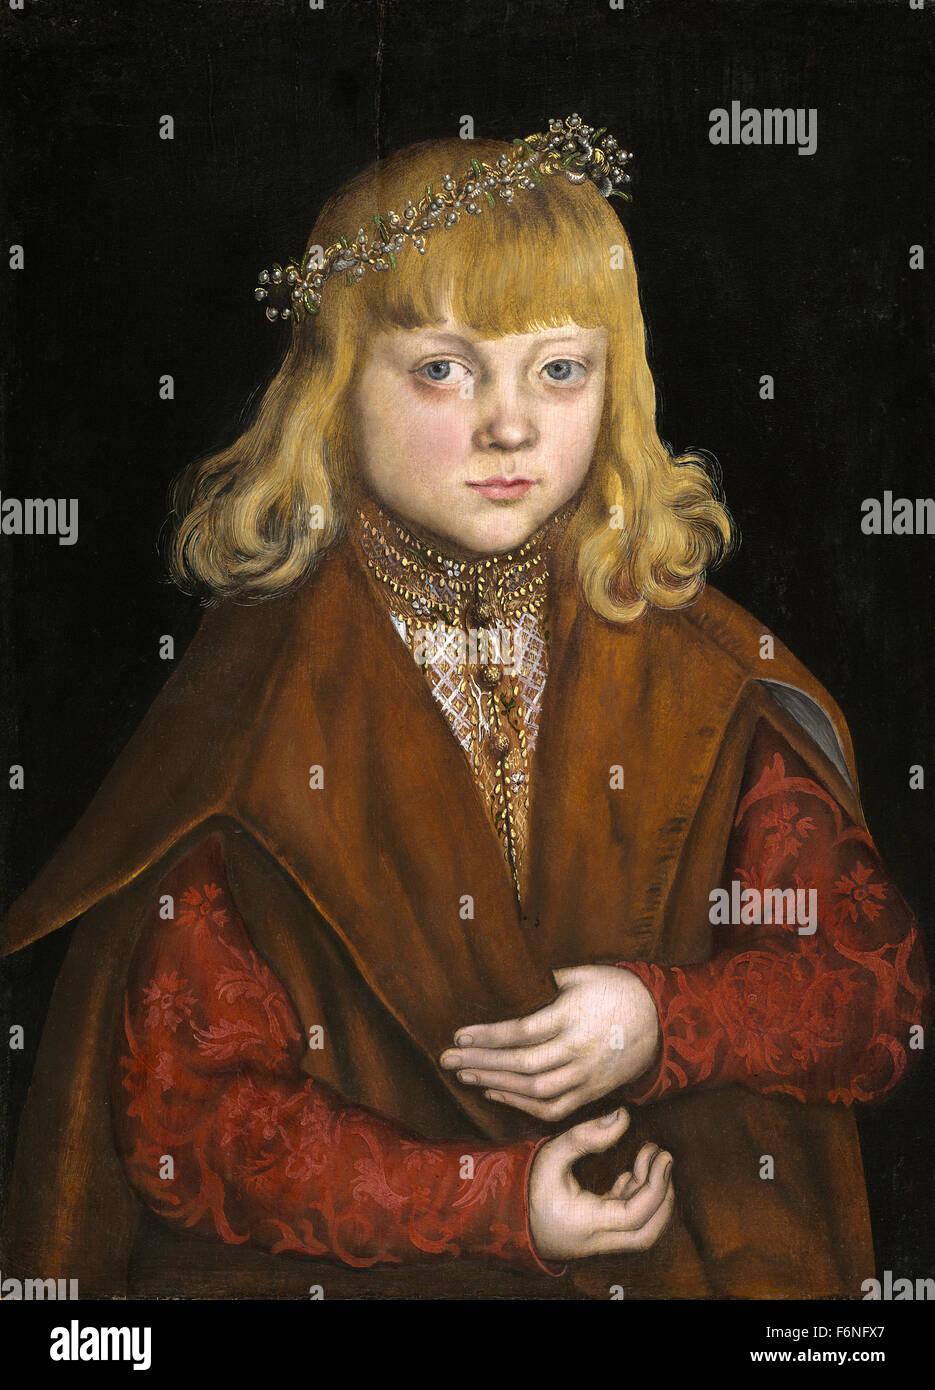 Lucas Cranach the Elder - A Prince of Saxony - Stock Image